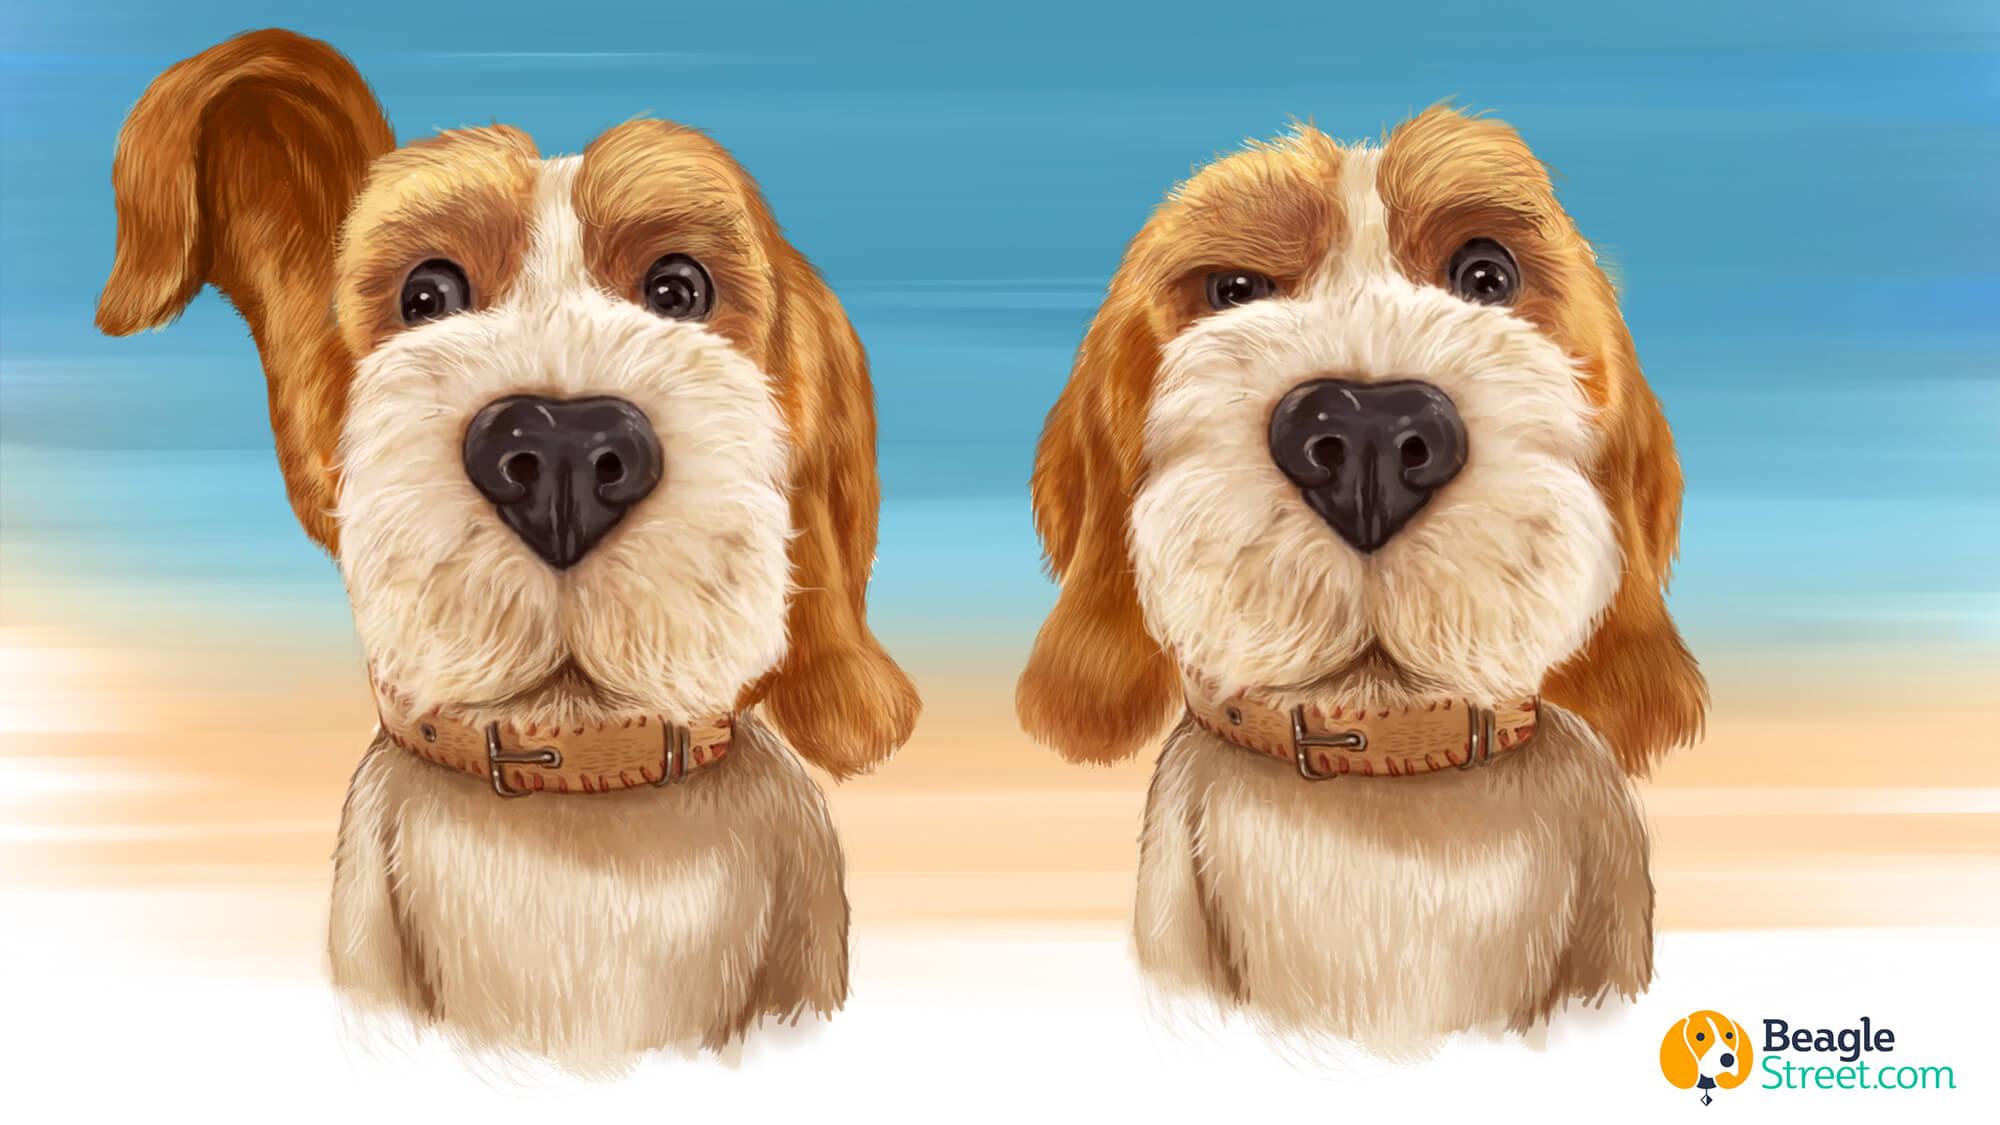 Beagle_Character_Design_1.jpg